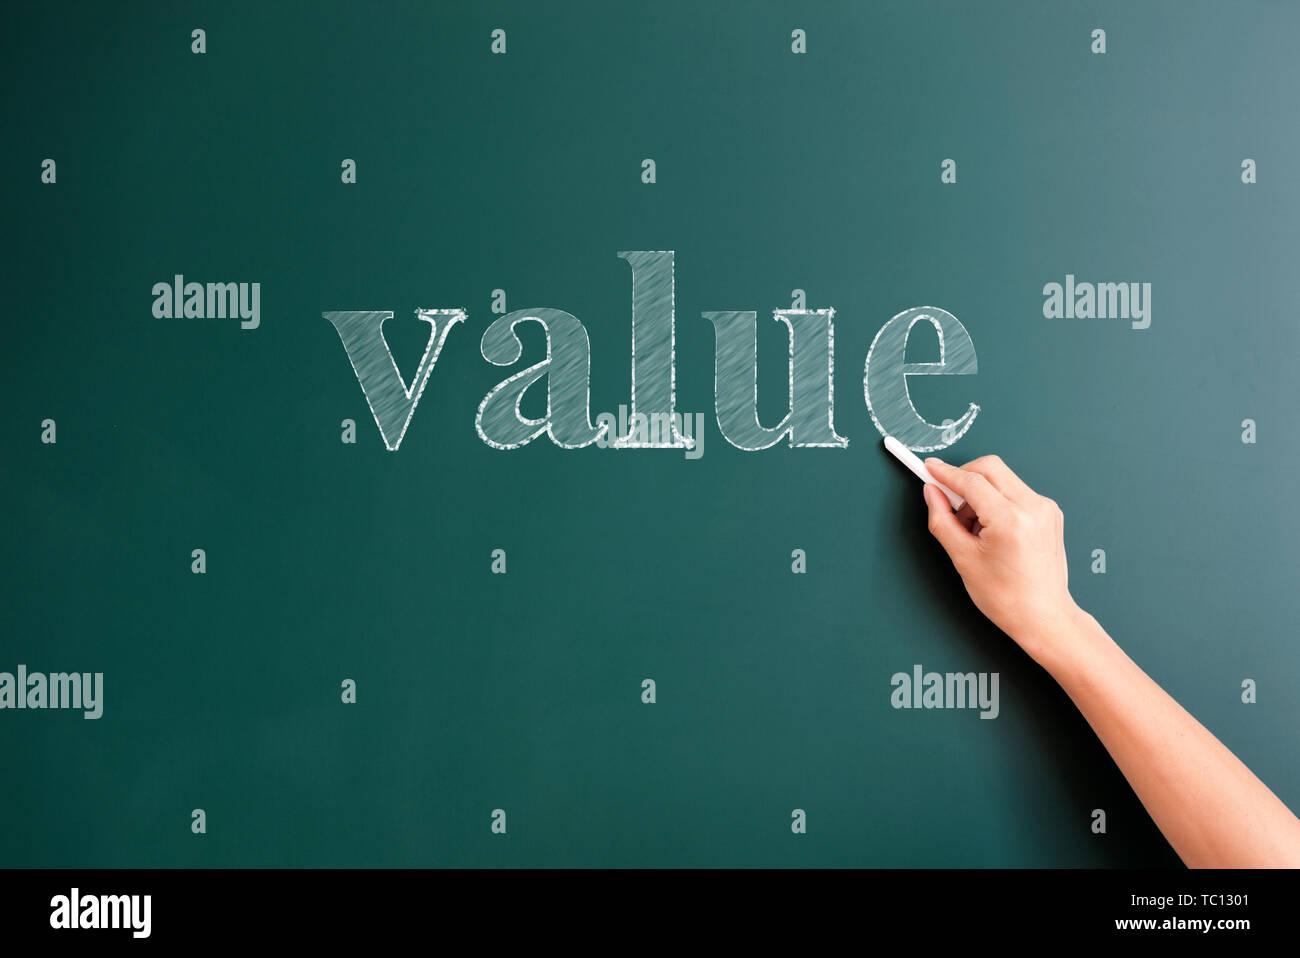 value written on blackboard - Stock Image